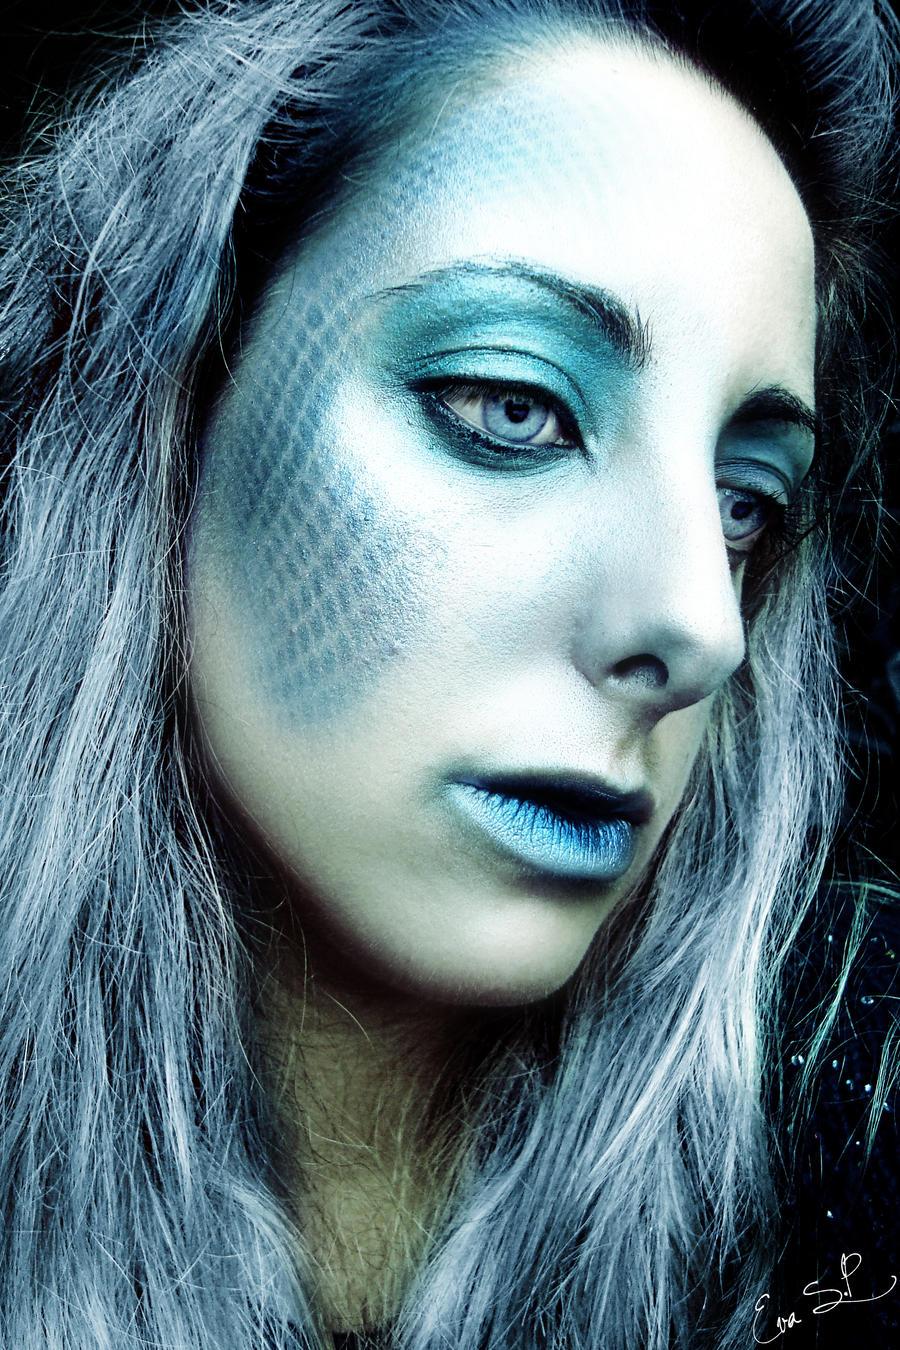 The Sad Mermaid (Halloween makeup) by Chuchy5